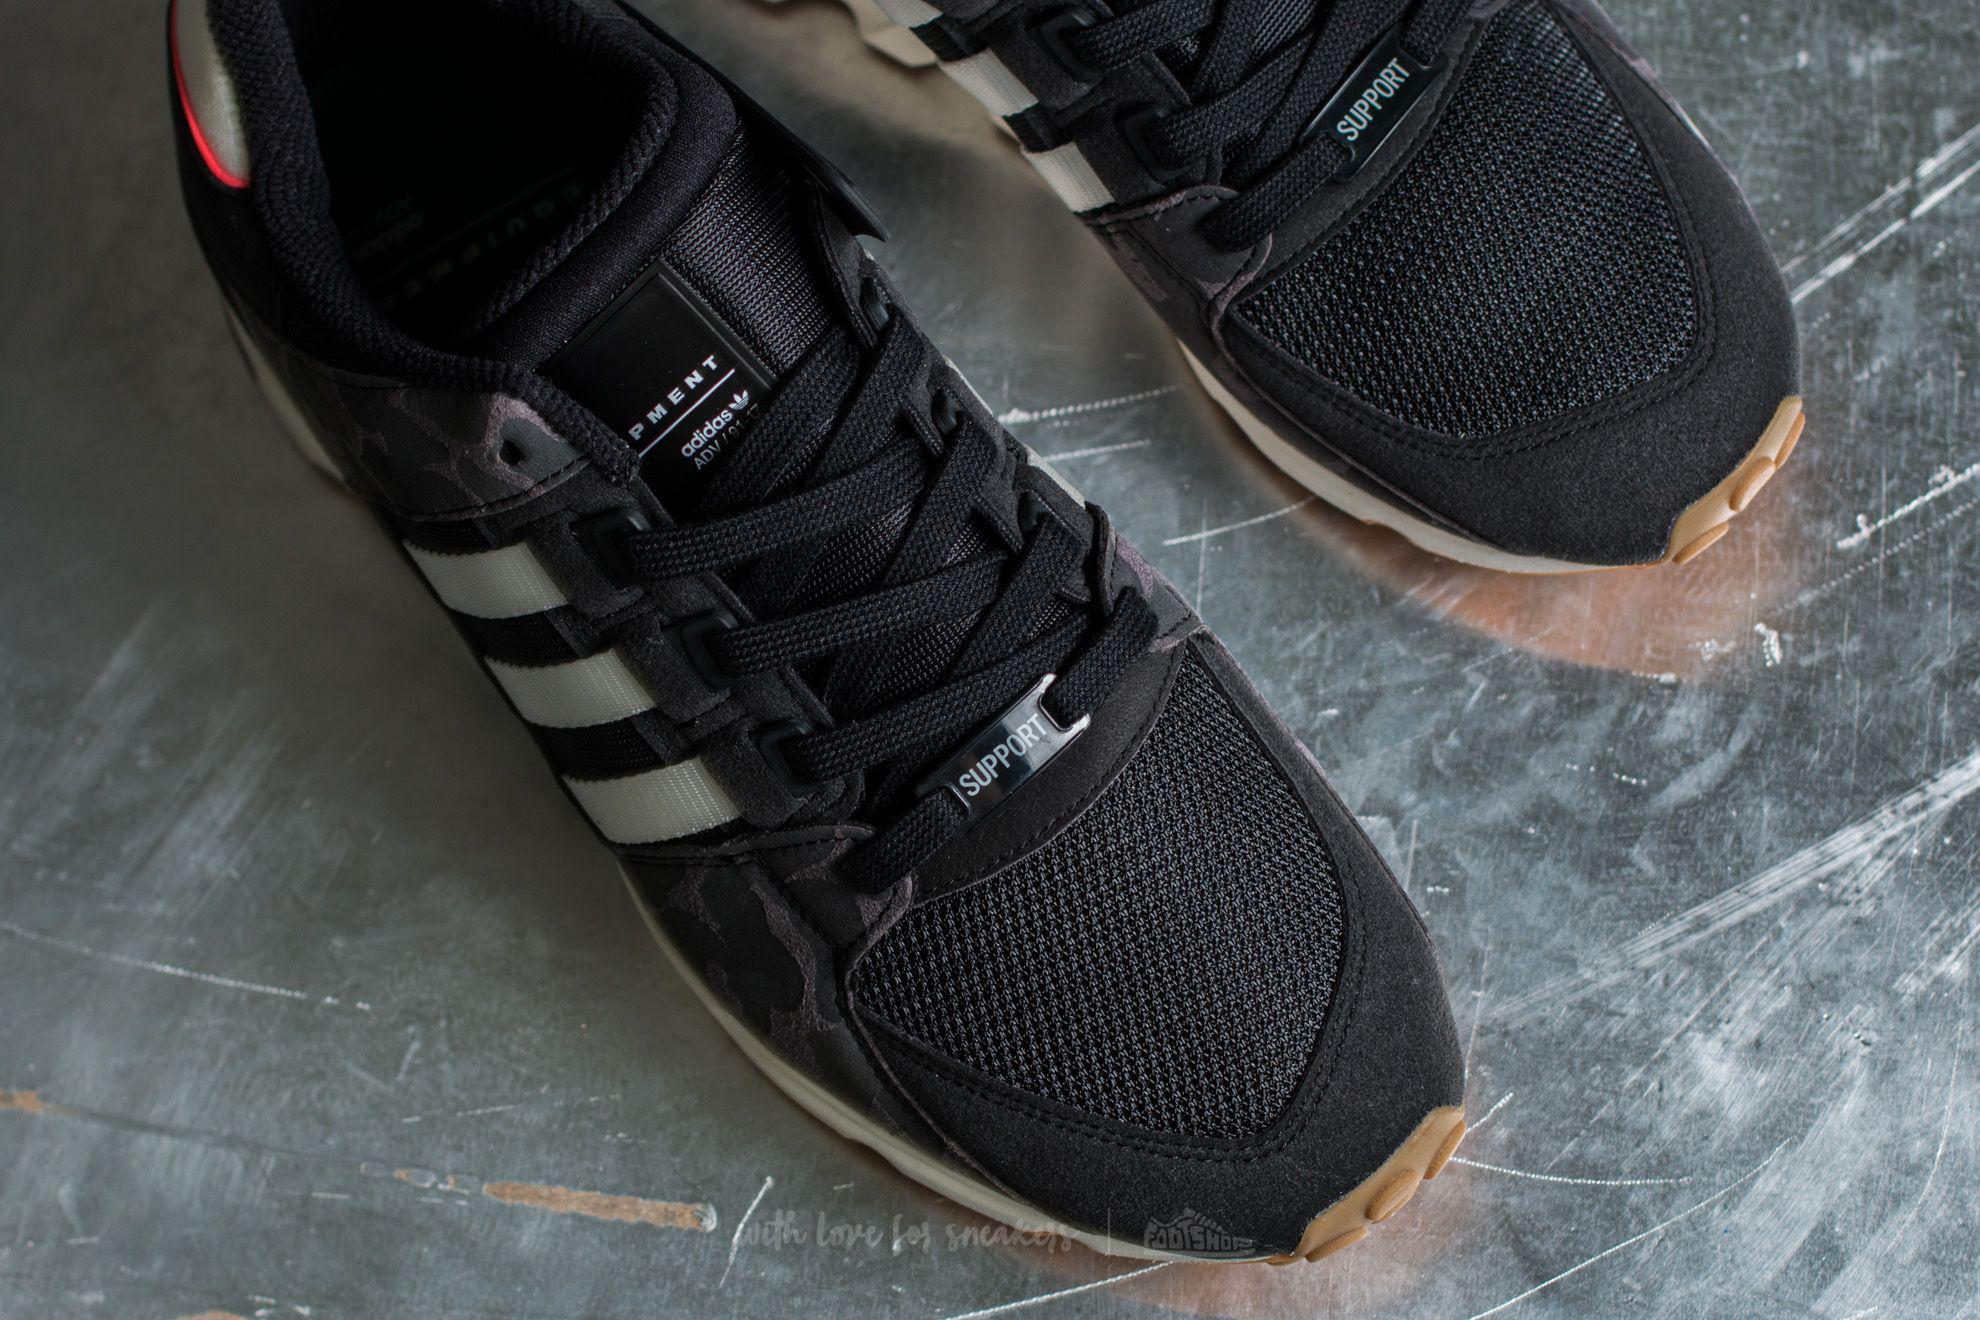 reputable site f2820 ccf68 Lyst - adidas Originals Adidas Eqt Support Rf Core Black Off